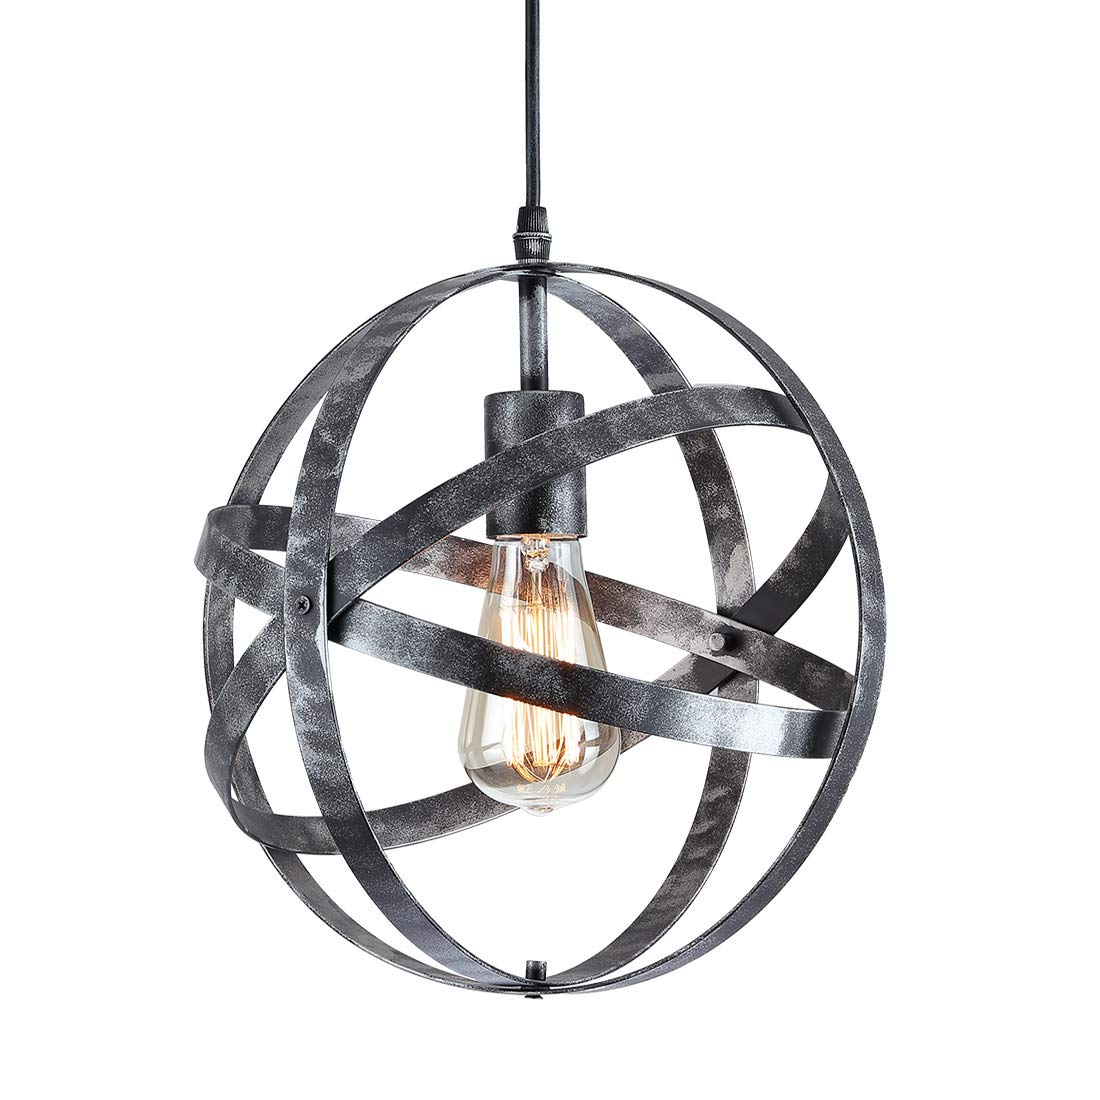 Industrial Vintage Metal Ceiling Pendant Light,Wrought Iron Light,Globe Metal Spherical Hanging Light Fixture for Kitchen Island Bedroom entryway Hallway Dining Room,Silver